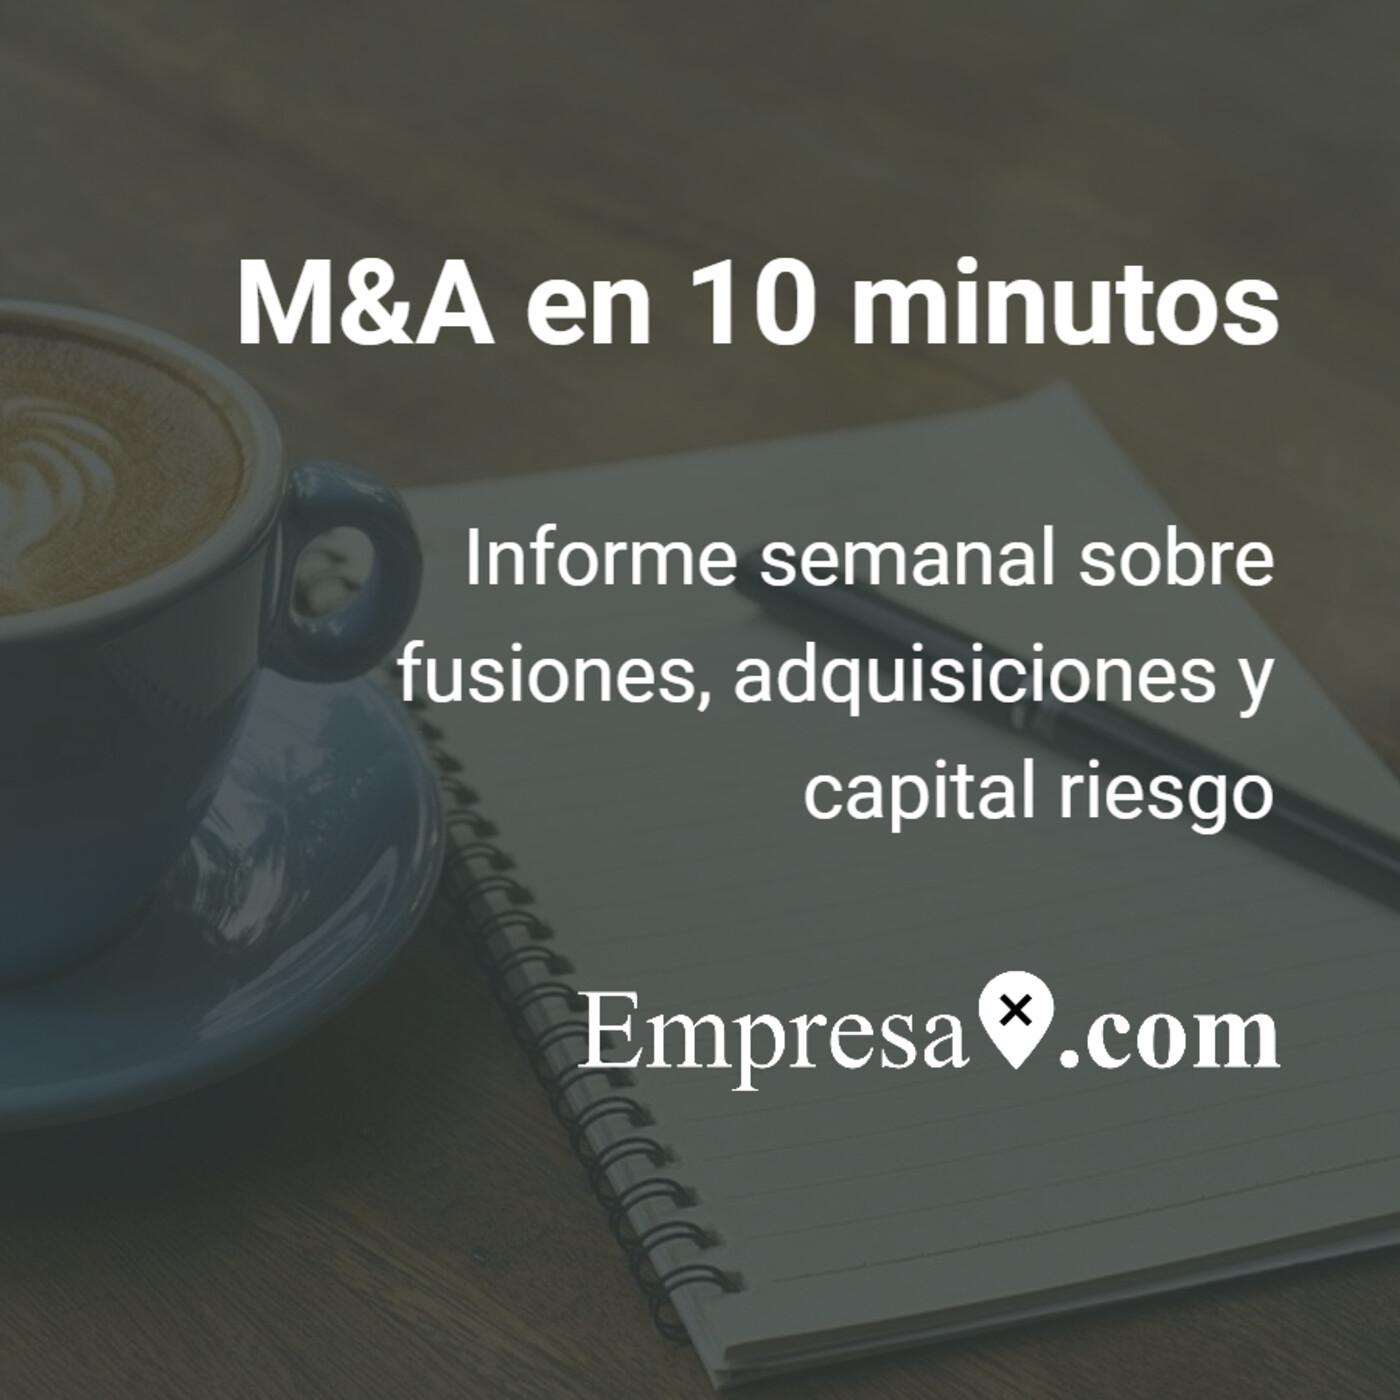 M&A en 10 minutos: GTI, Clerhp, CUNEF, Adevinta, KKR y Grupo Puentes